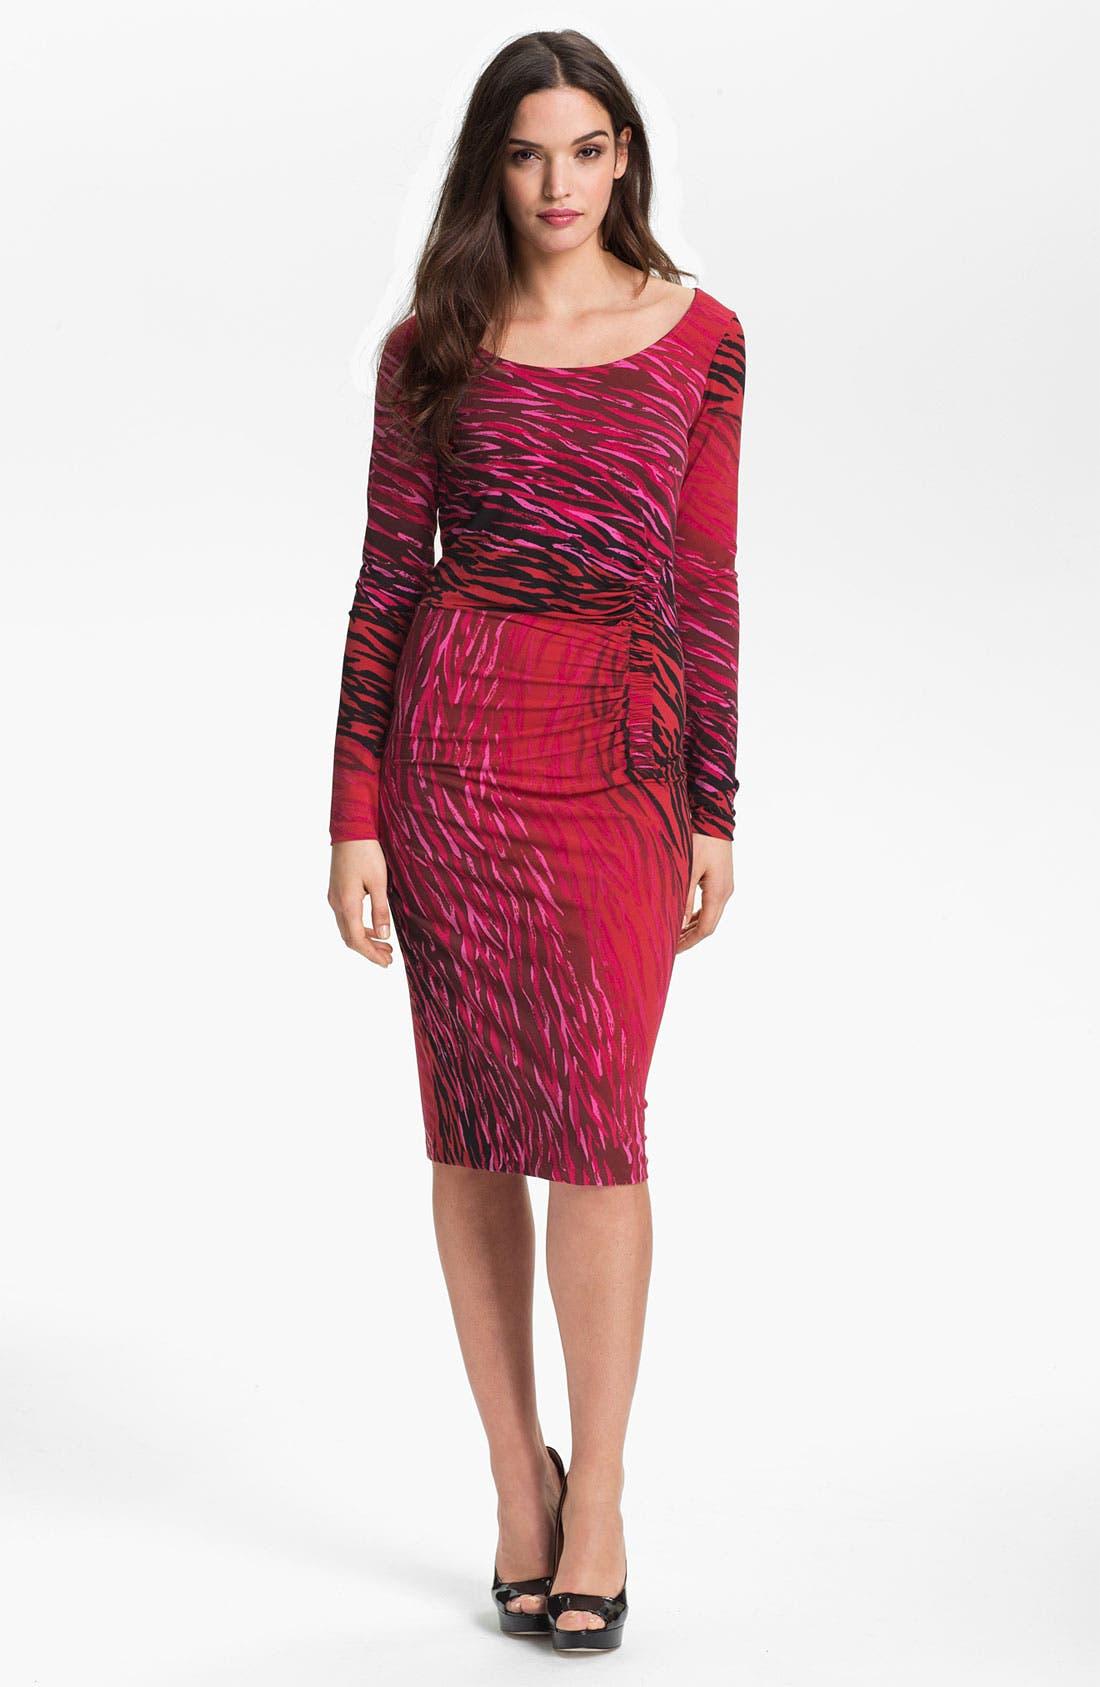 Main Image - Anne Klein Ombré Zebra Print Dress